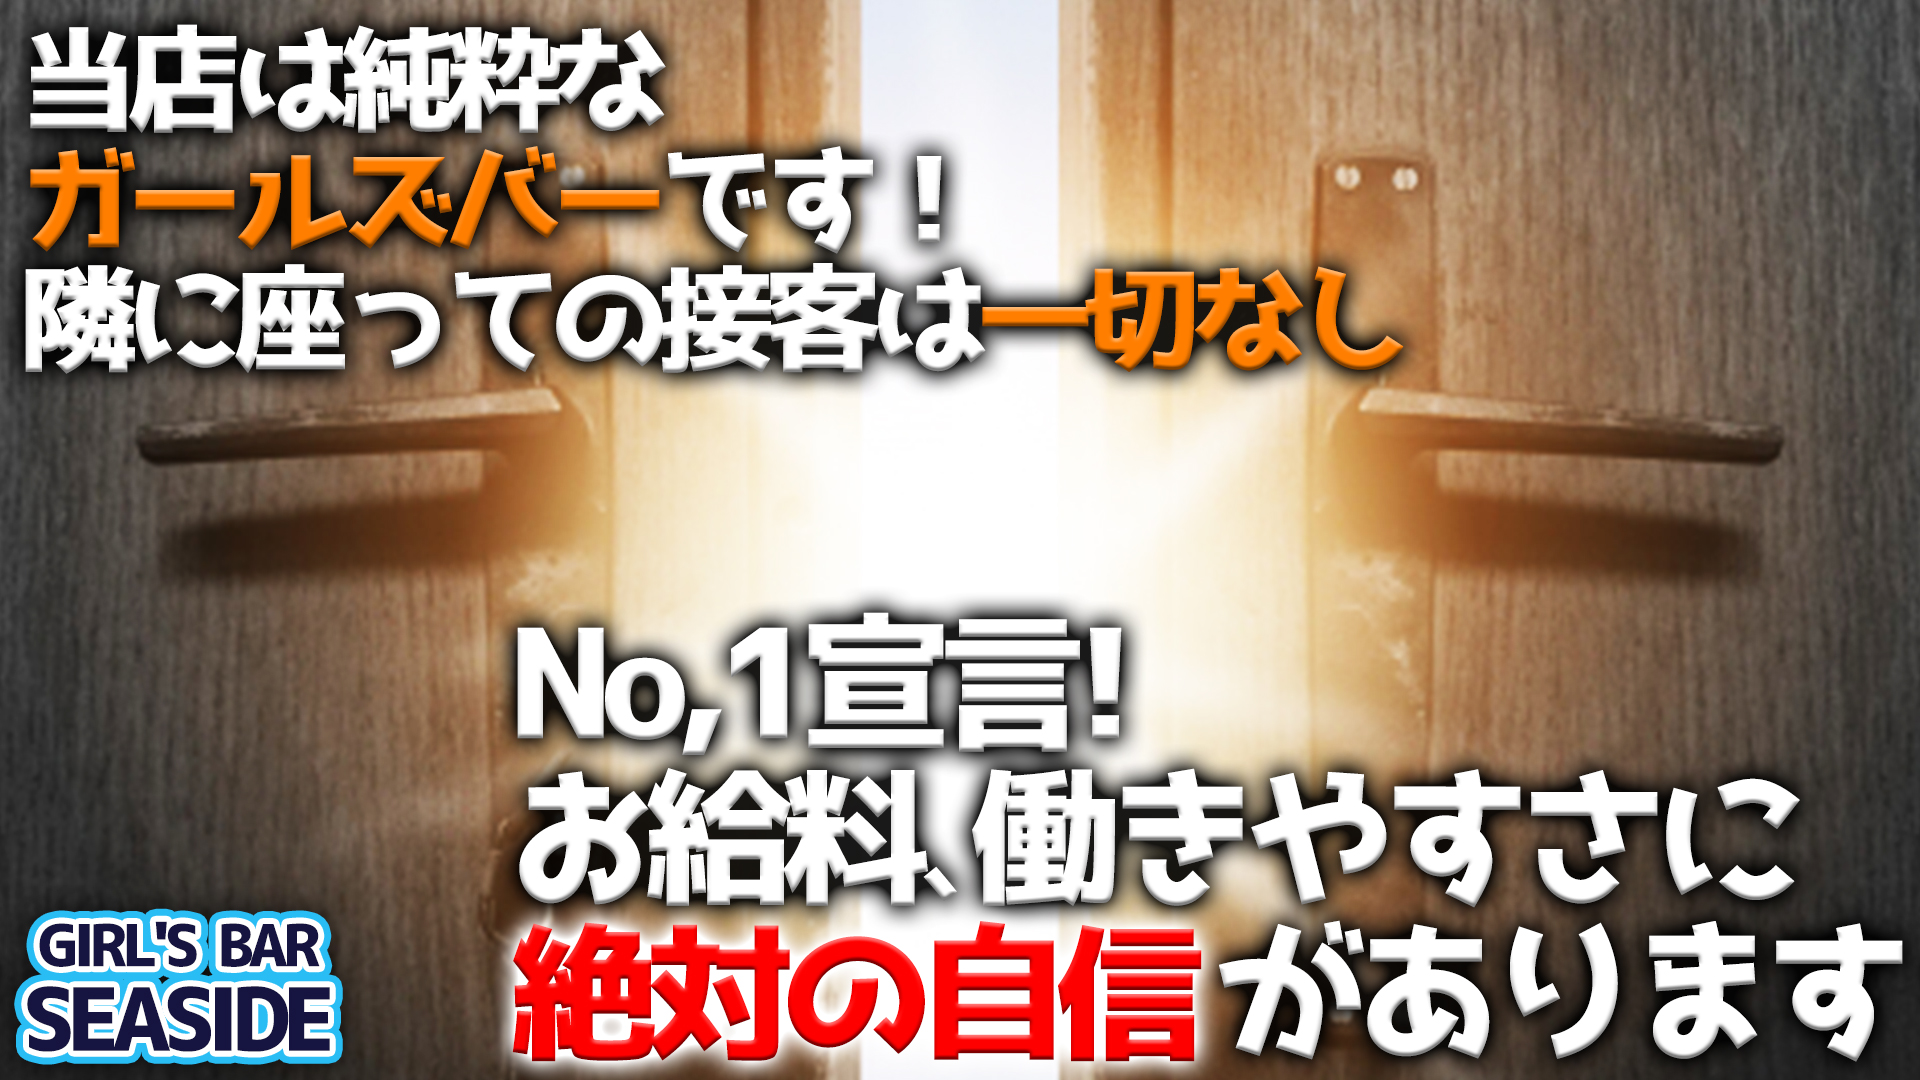 GIRL'S BAR SEASIDE<シーサイド> 赤羽 ガールズバー TOP画像